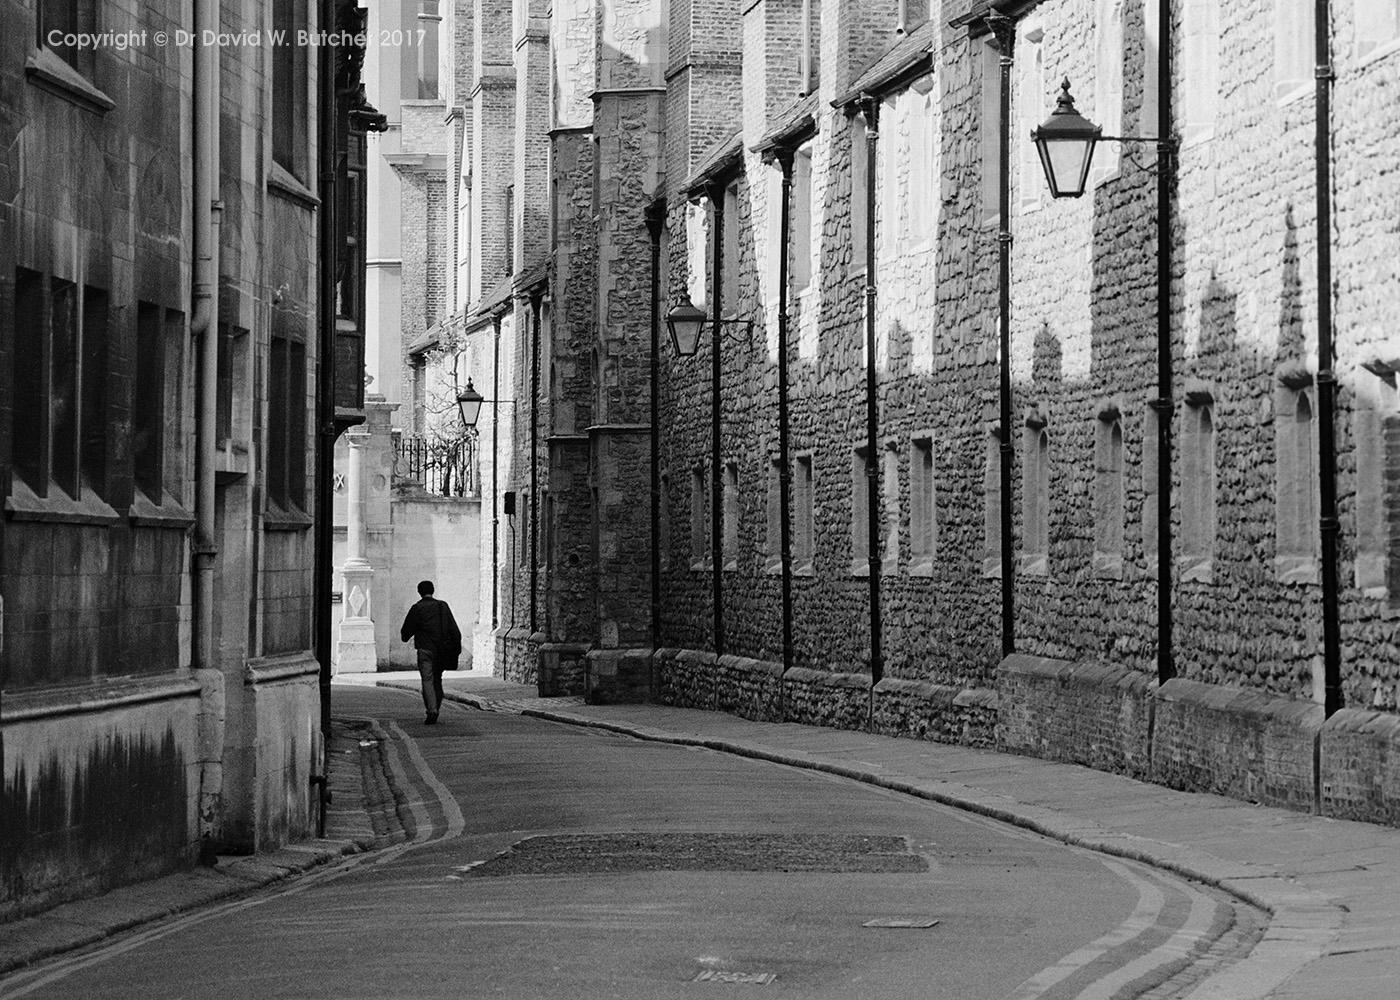 Trinity Lane Cambridge, England